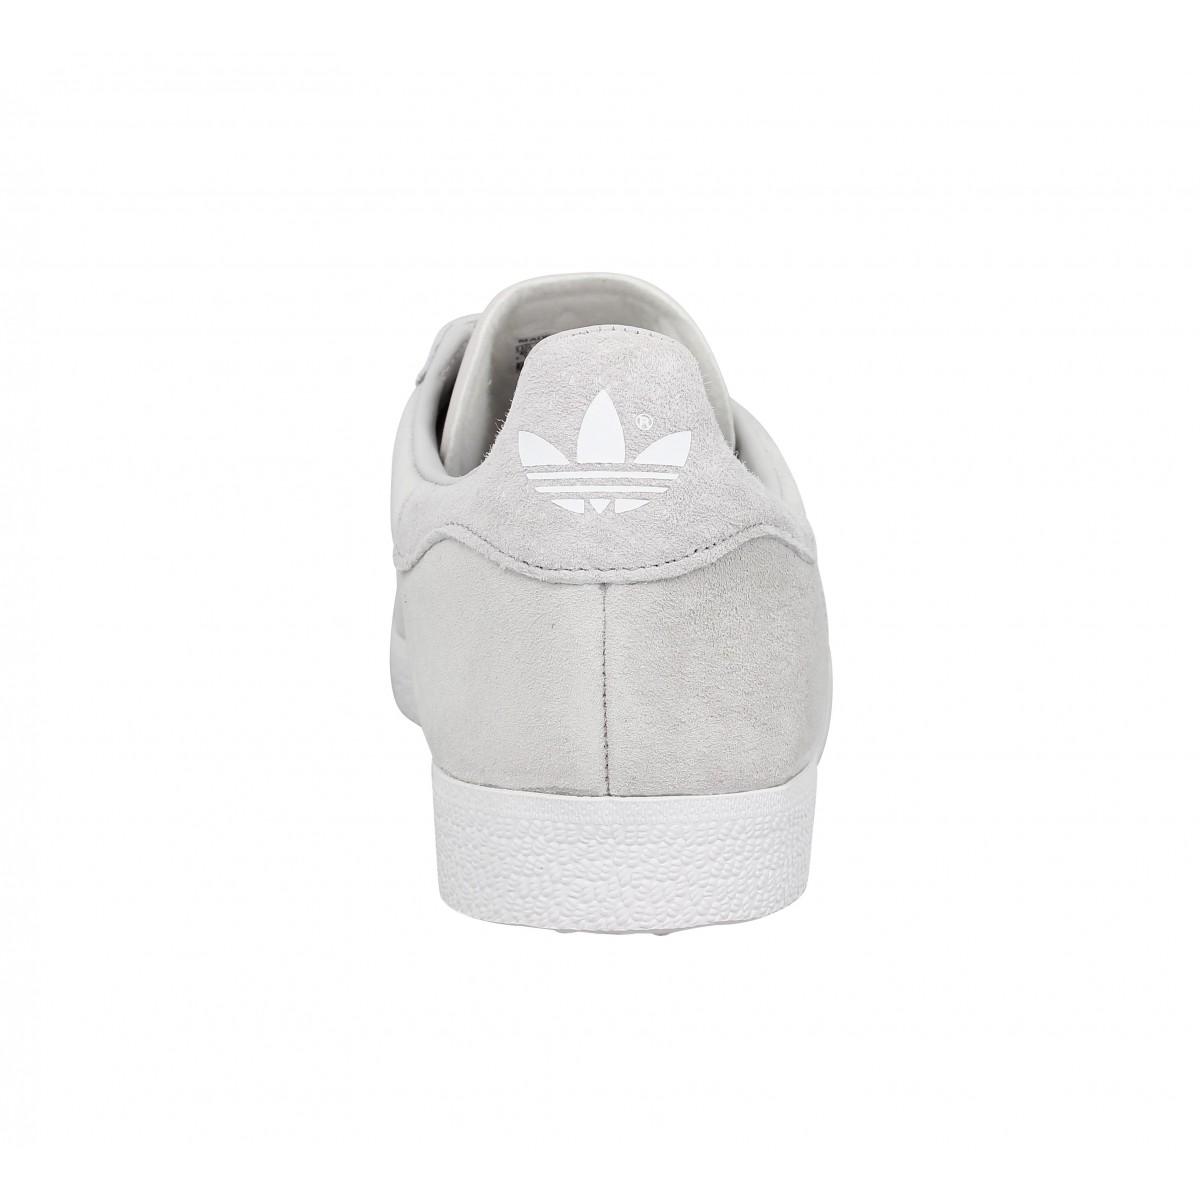 Chaussures Adidas gazelle velours femme grey femme   Fanny chaussures